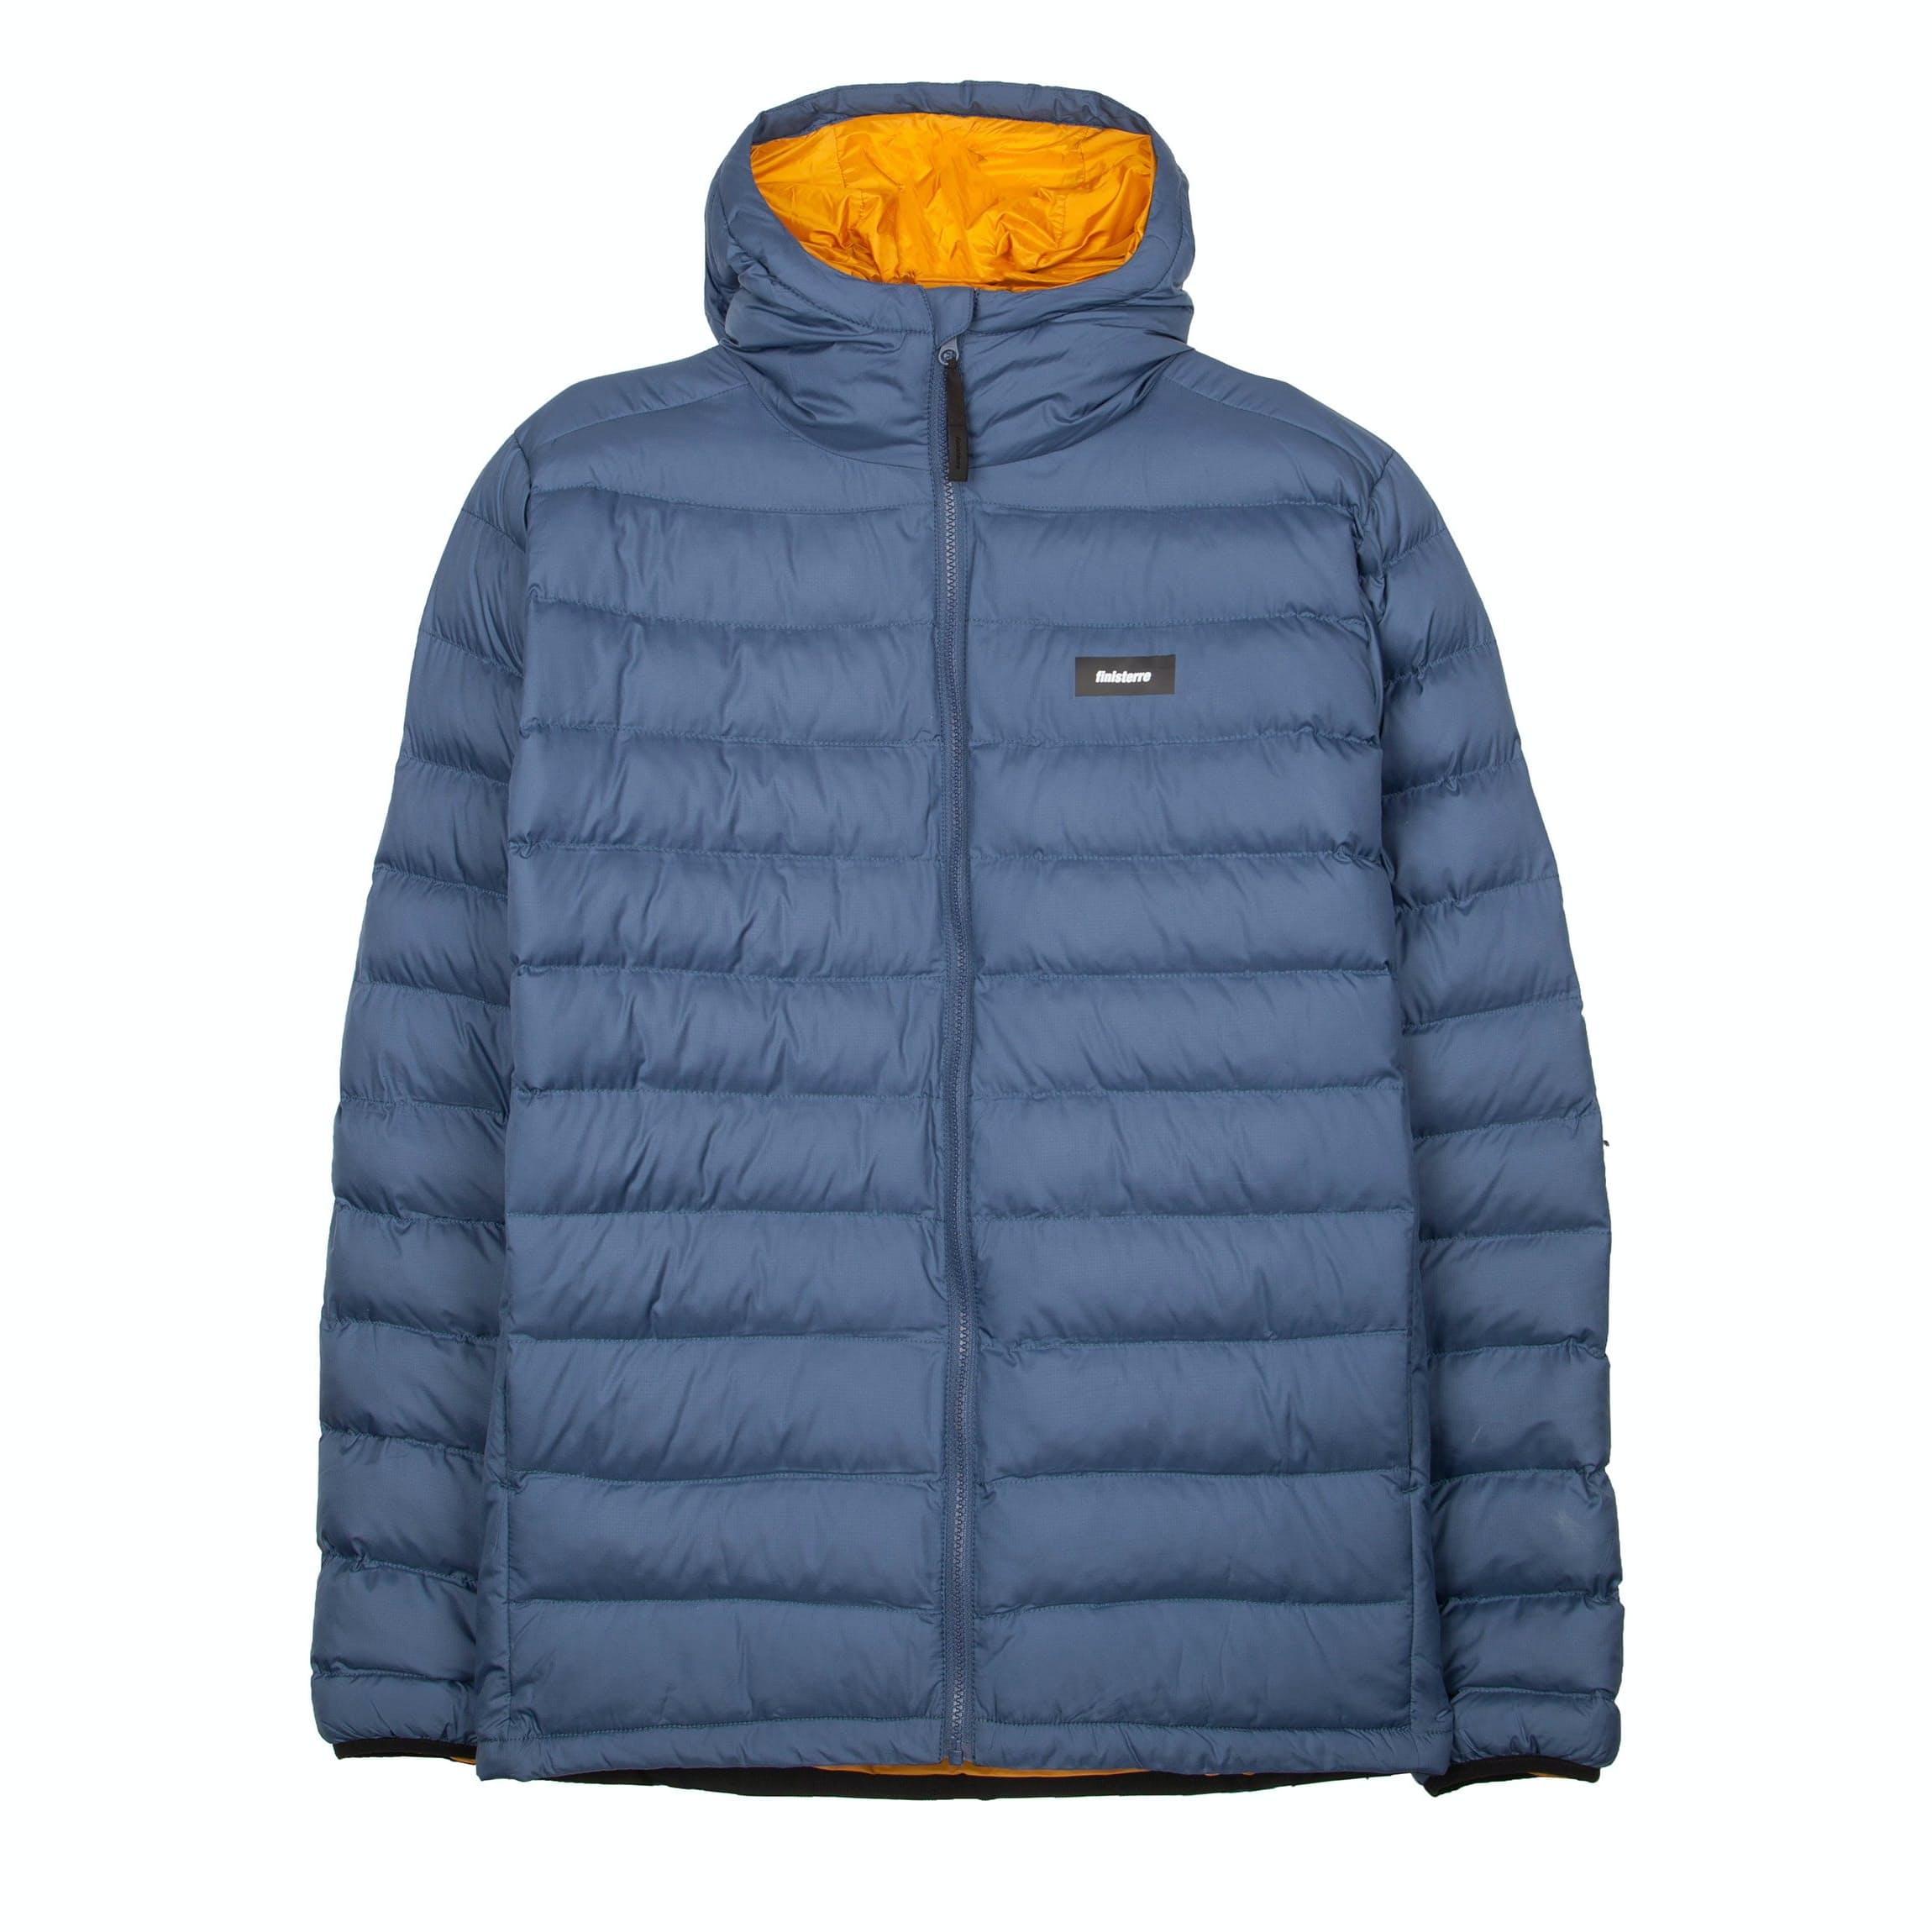 Ejafsekwuv finisterre nebulas jacket 0 original